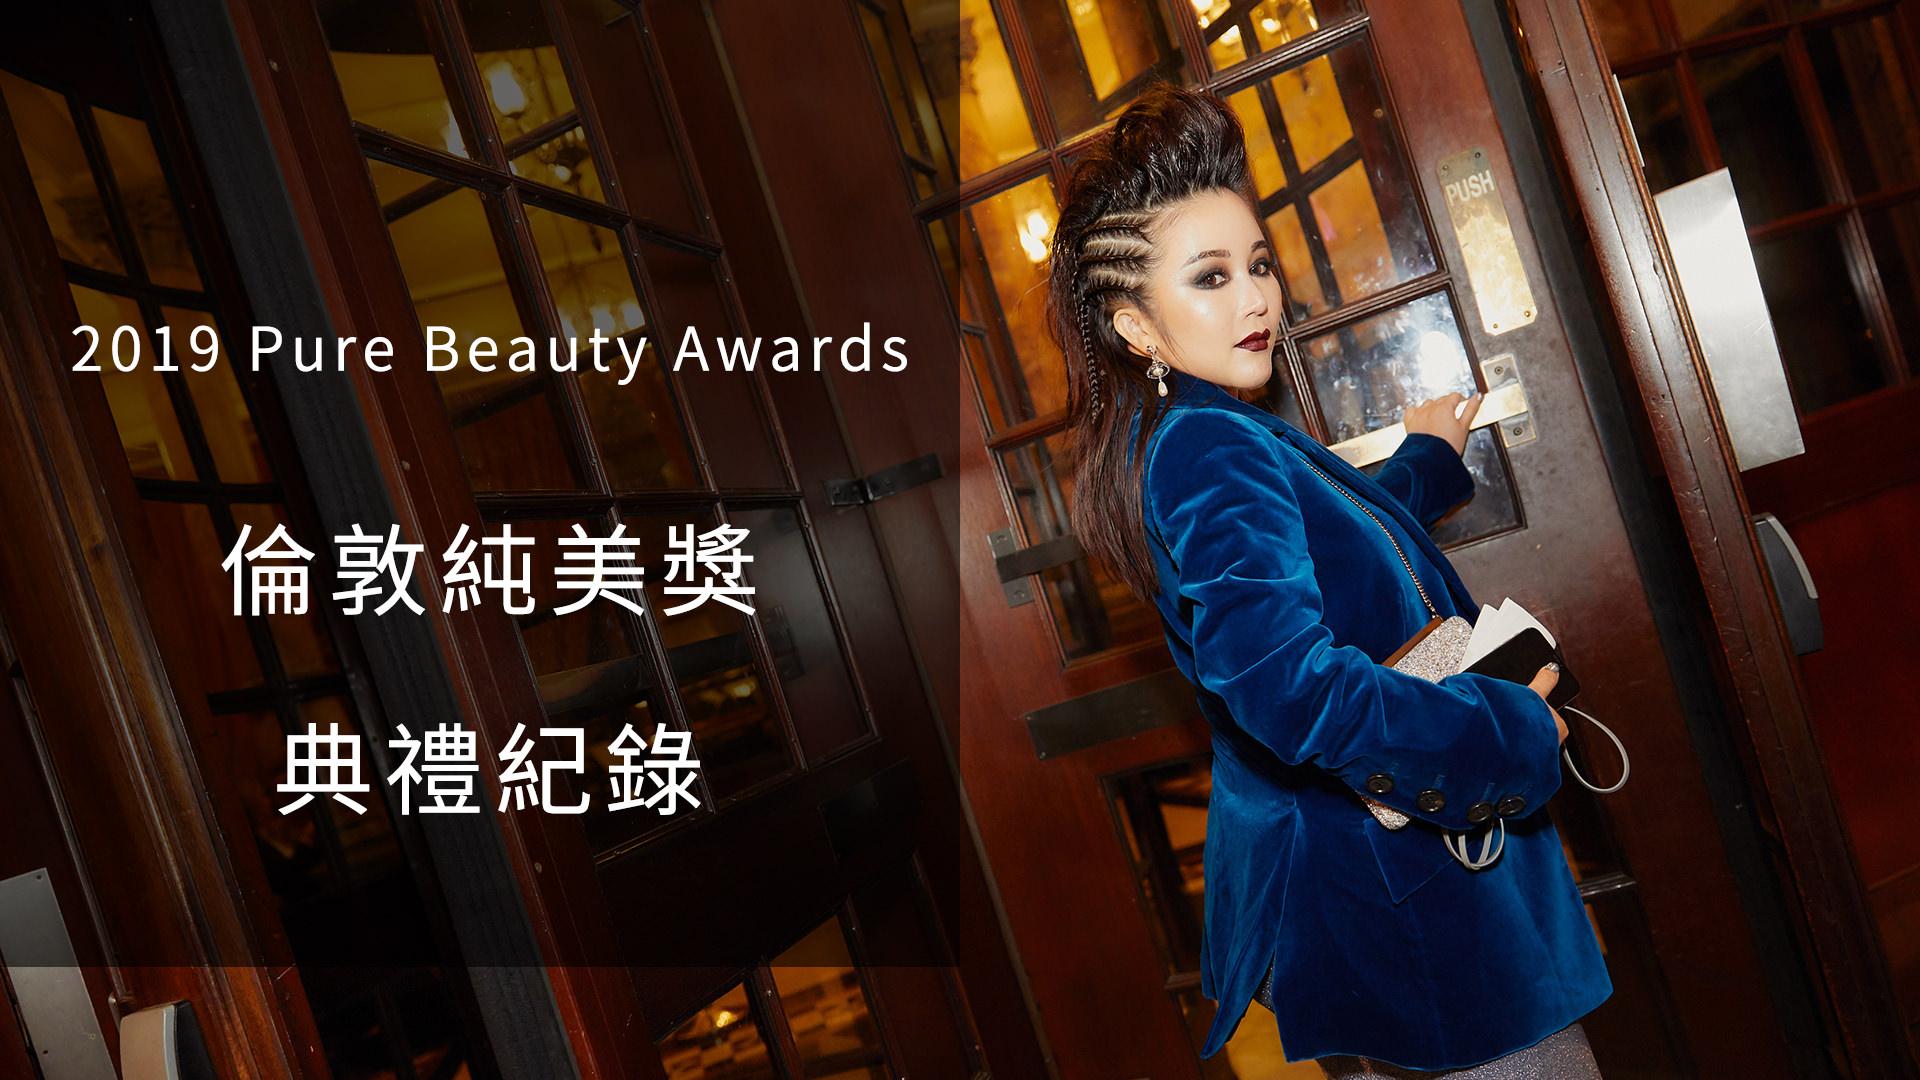 [YOUTUBE] 2019 Pure Beauty Awards 倫敦純美獎典禮紀錄~